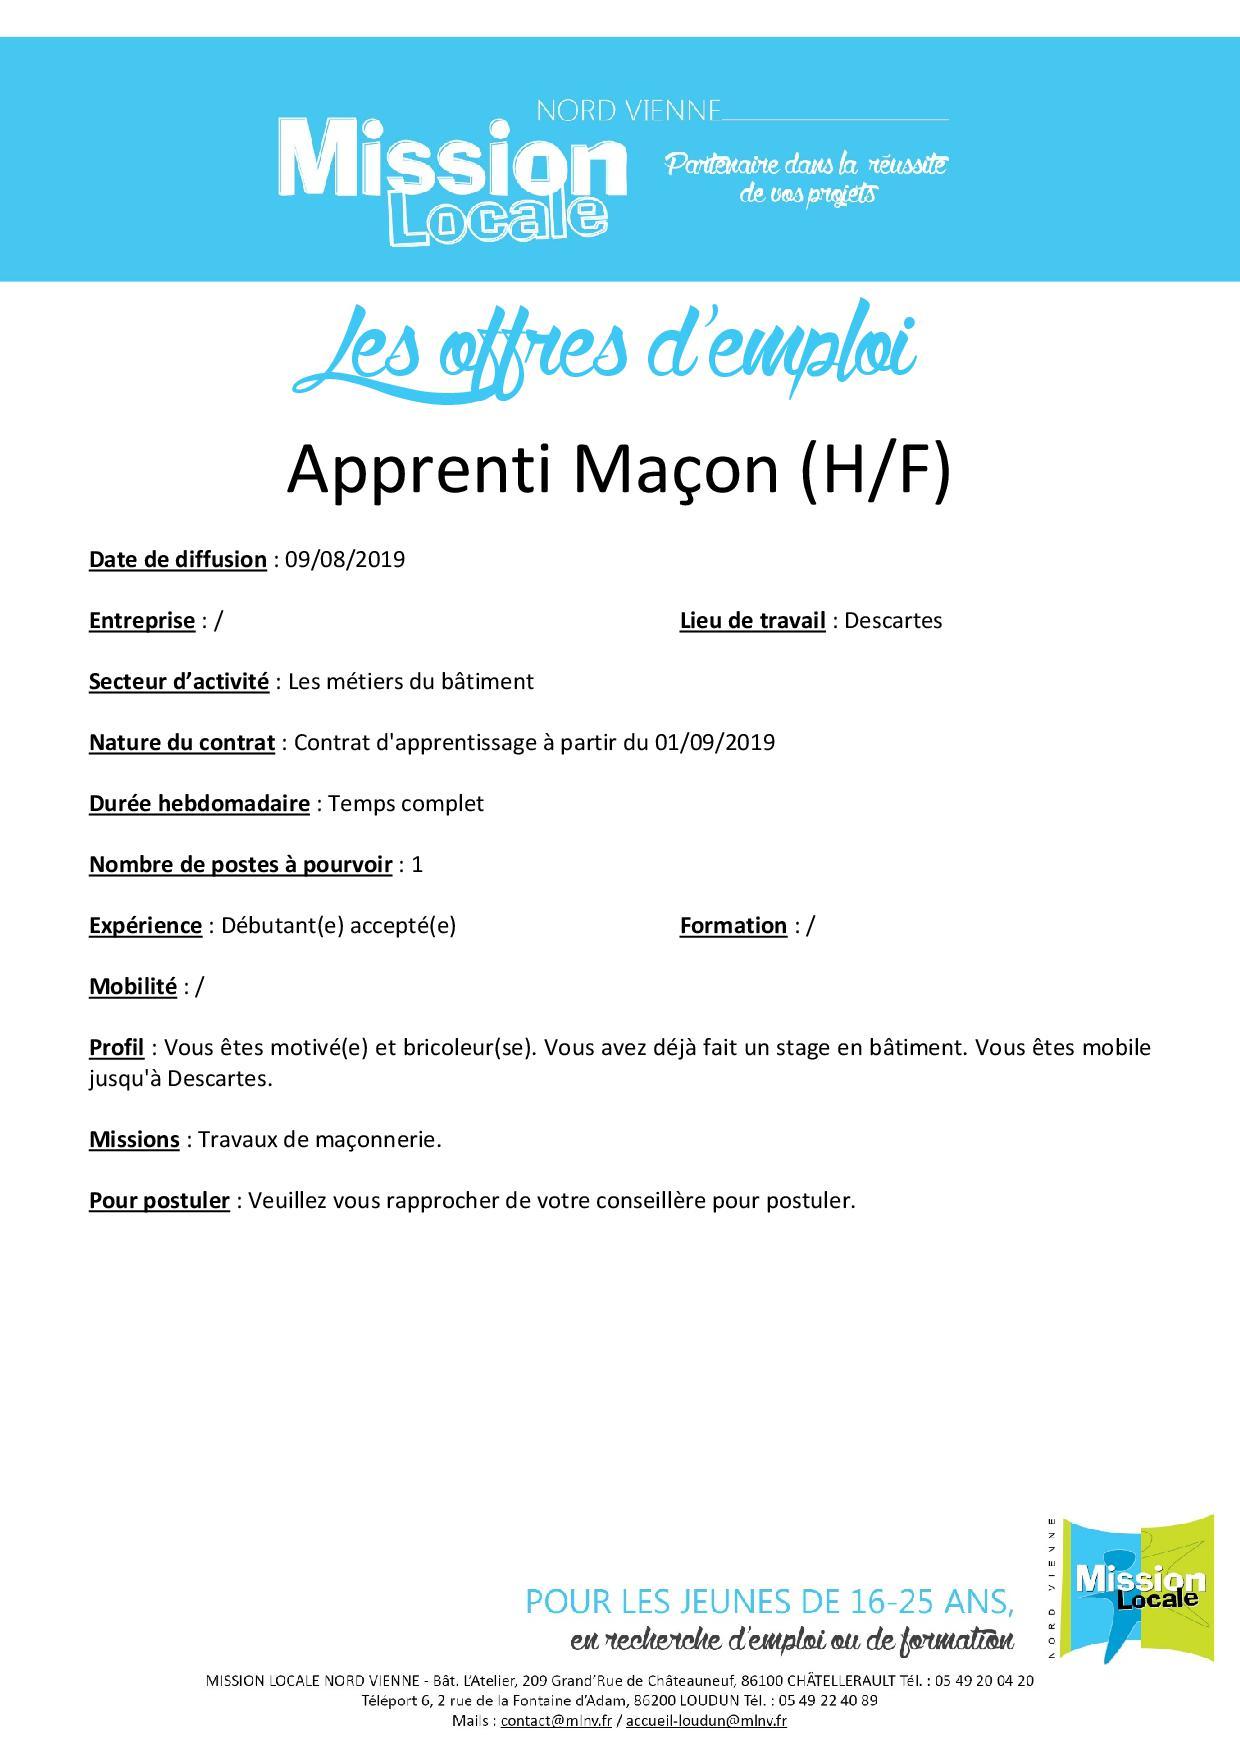 Apprenti maçon (H/F)